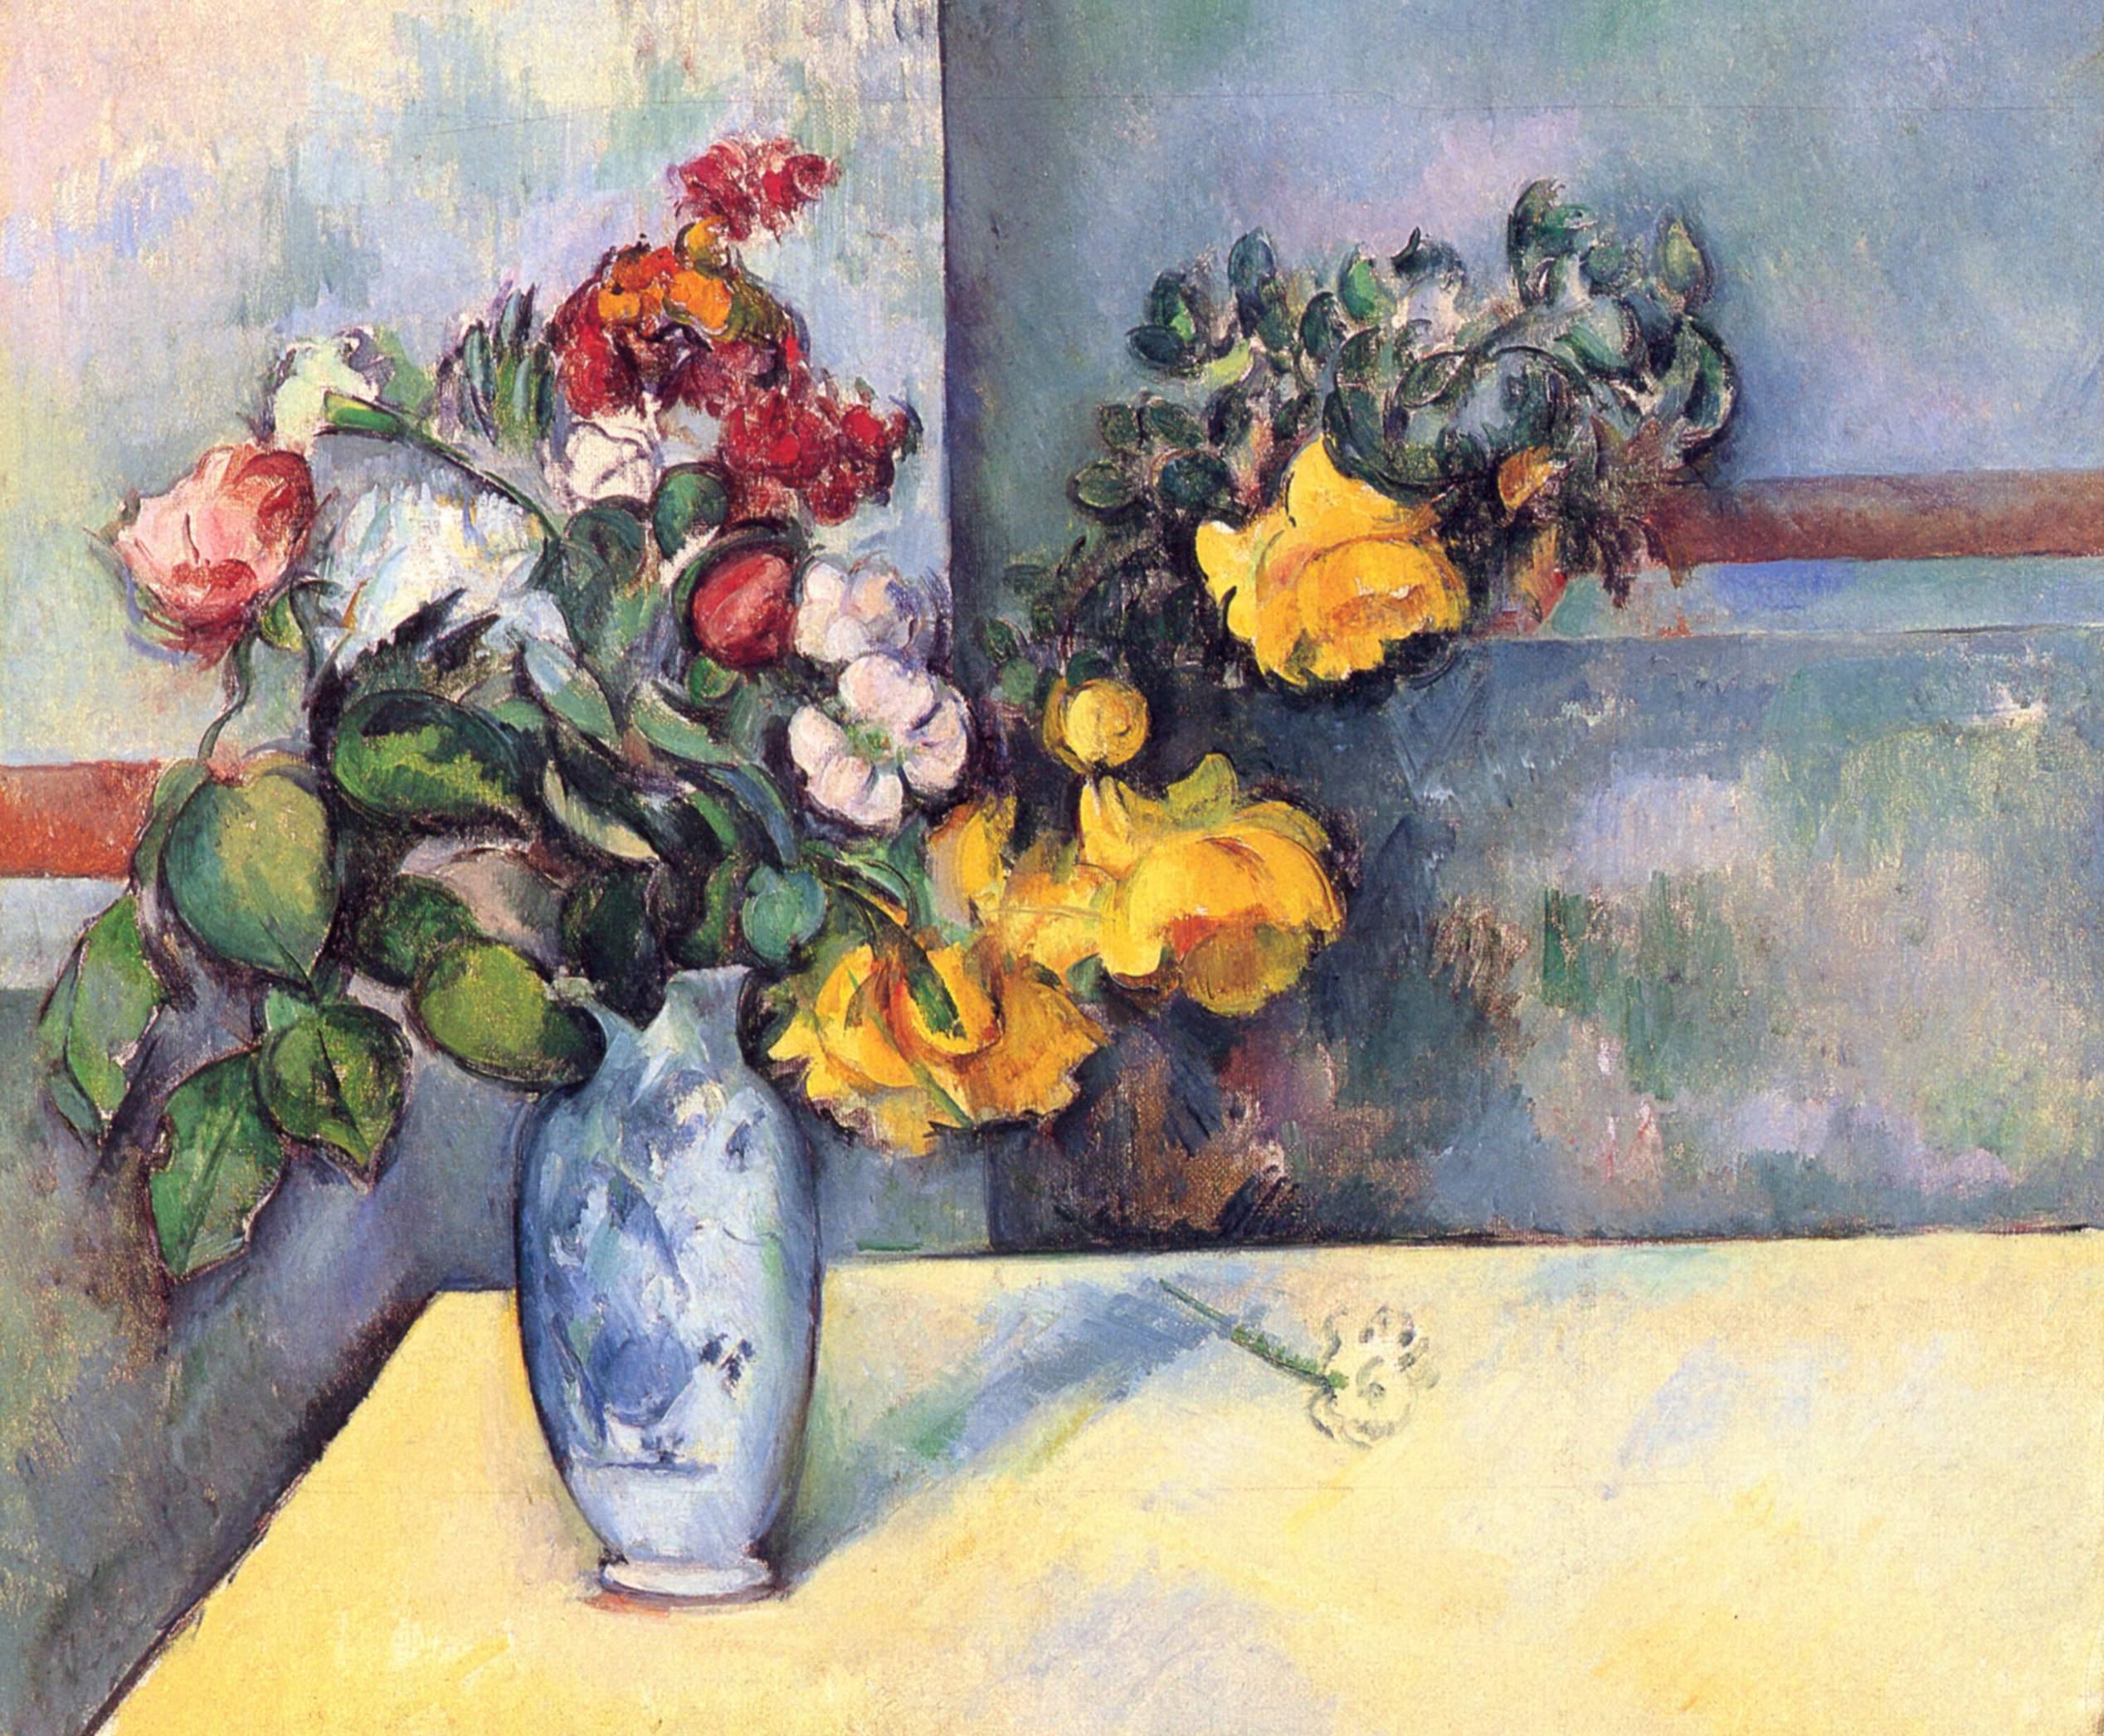 paul c233zanne stilllife flowers in a vase 1888